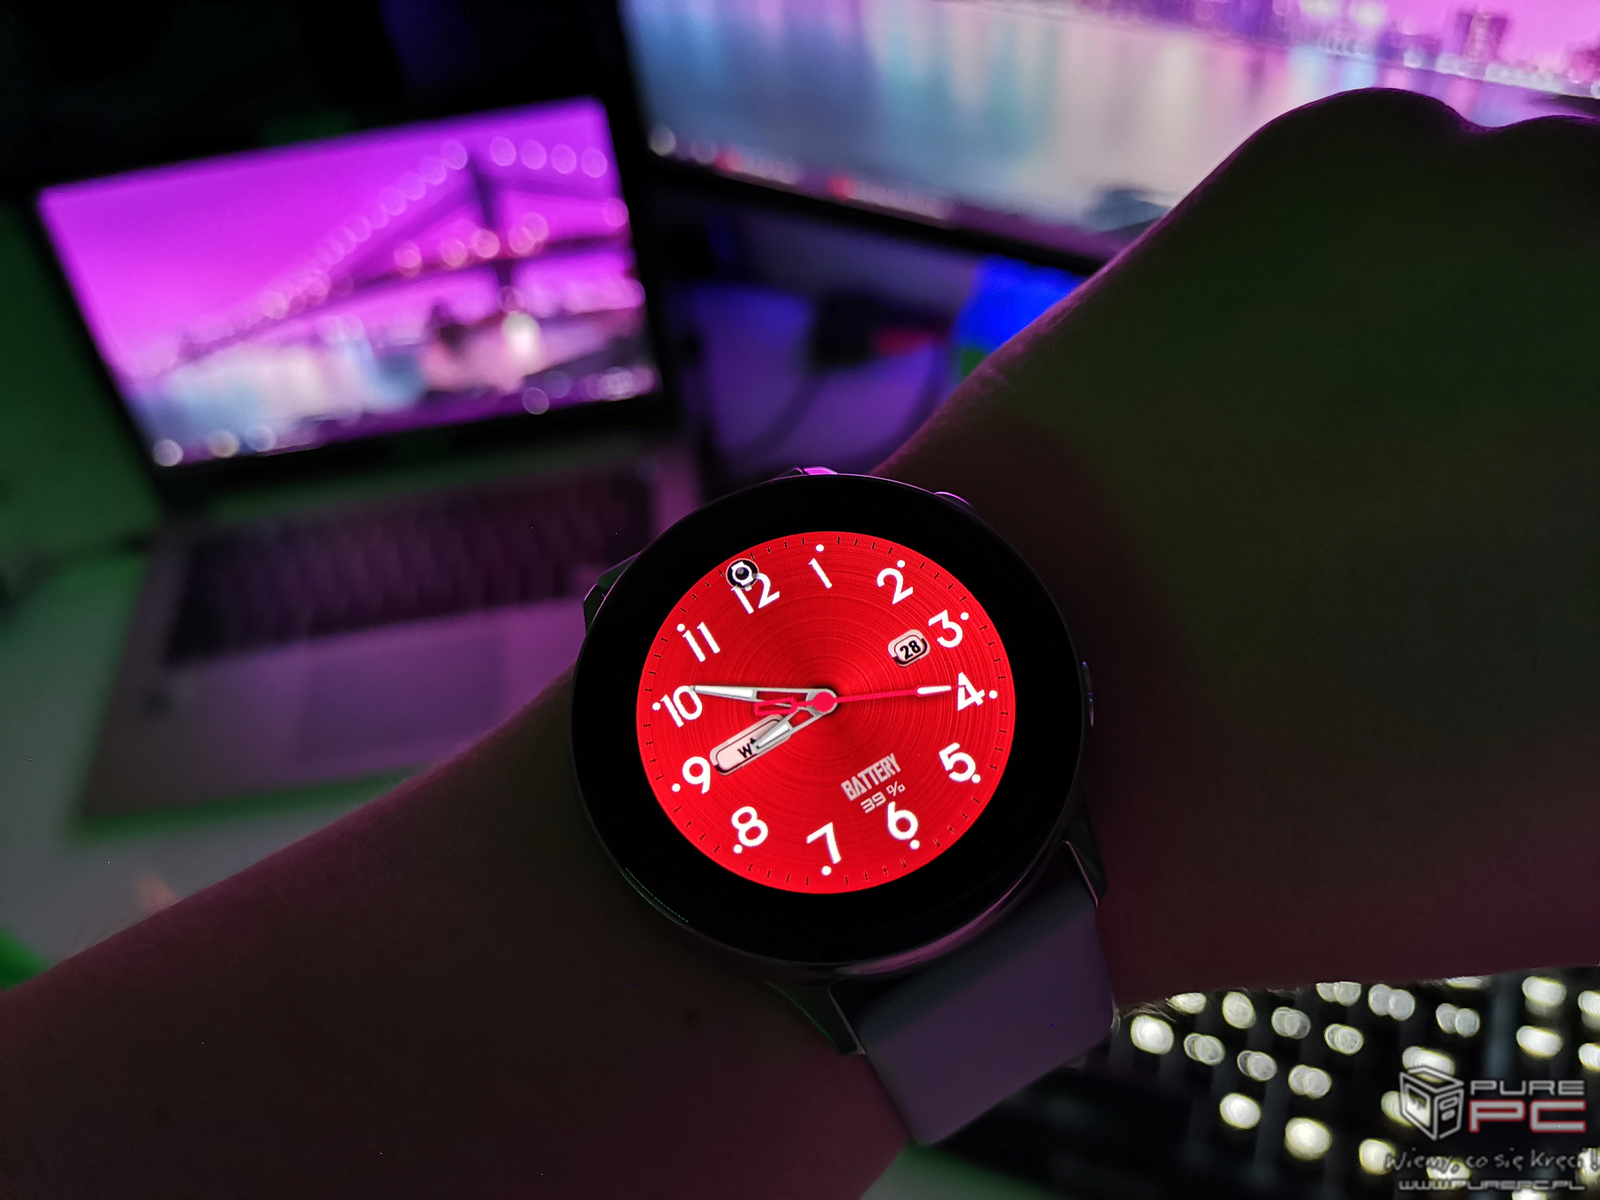 test smartwatcha samsung galaxy watch active czas na sport. Black Bedroom Furniture Sets. Home Design Ideas